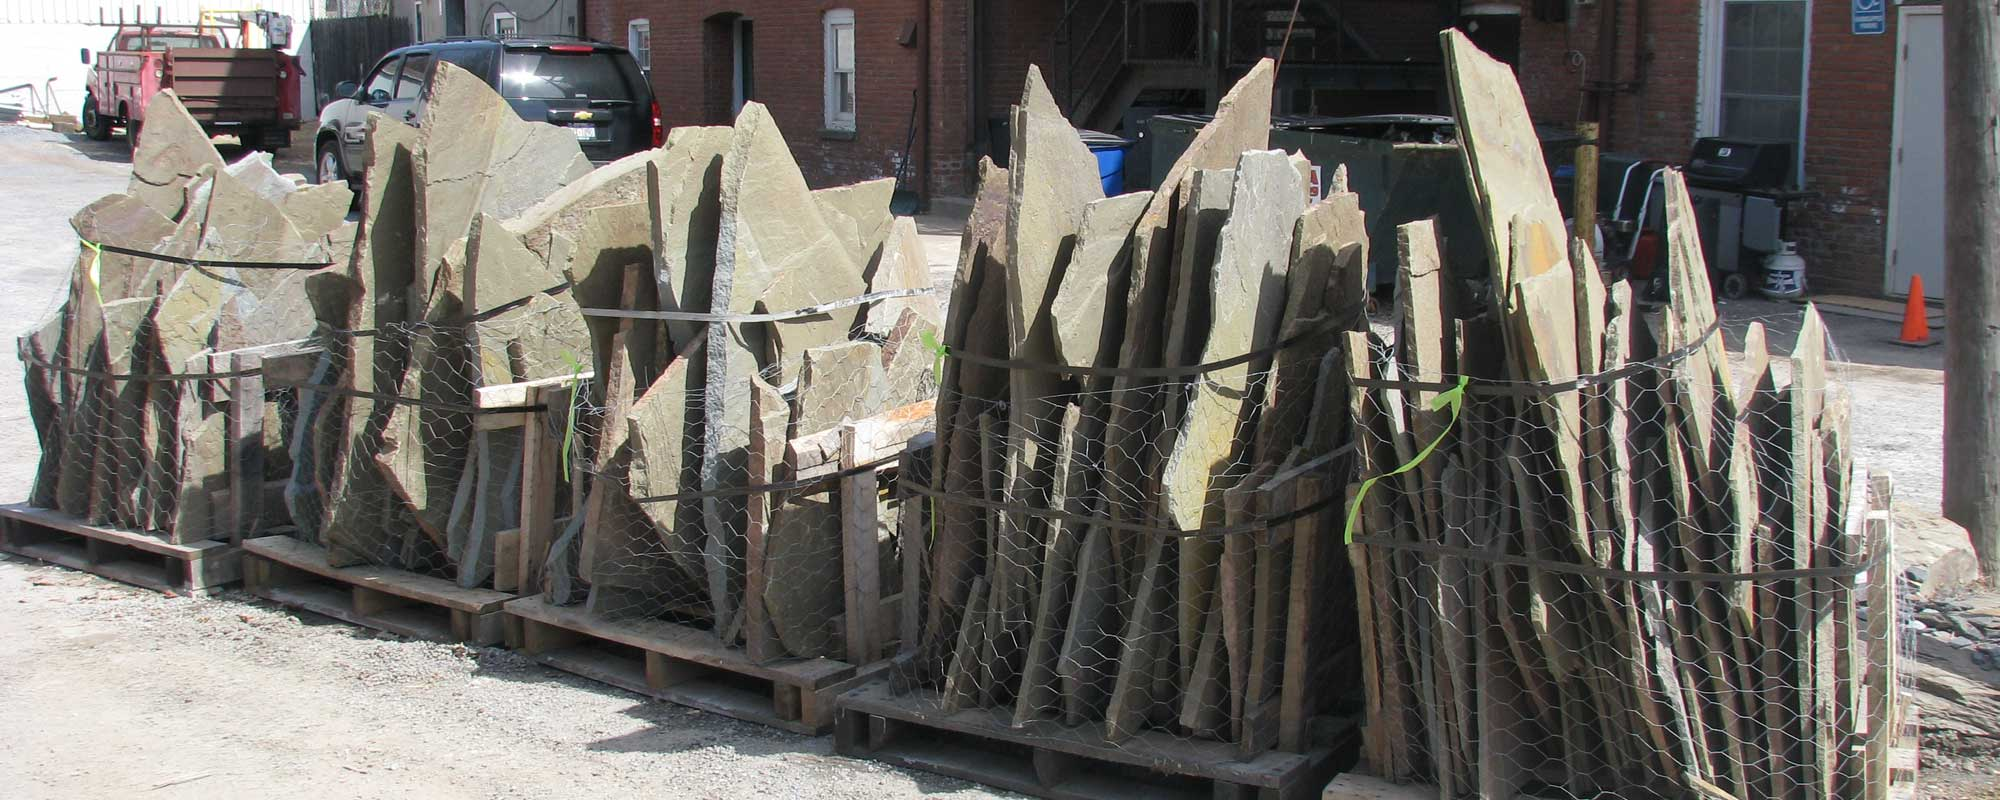 Pallets of Bluestone Irregular Cuts